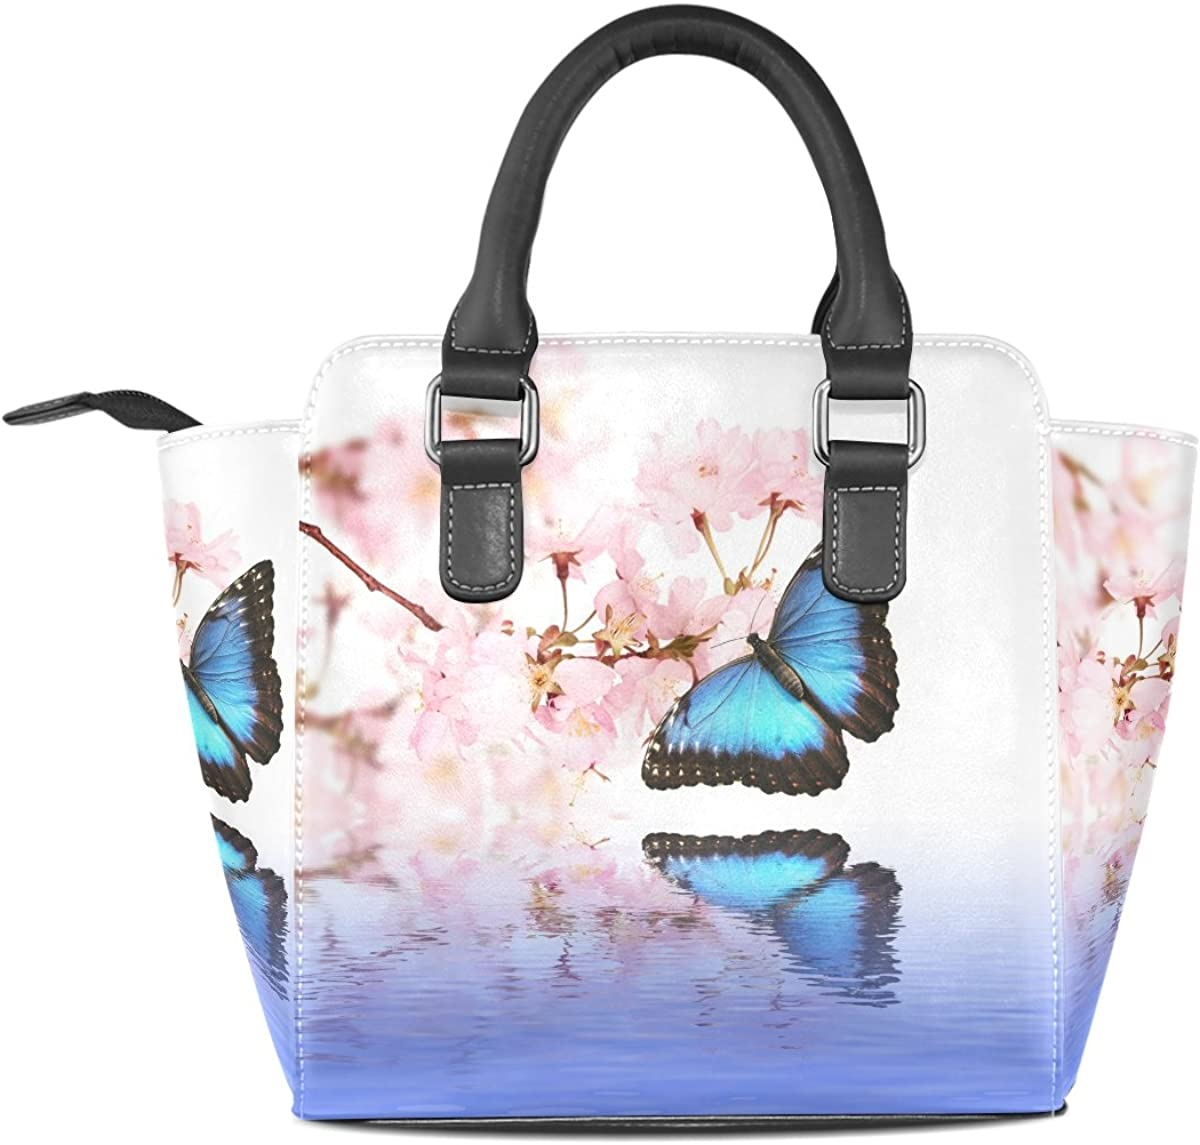 INTERESTPRINT Blooming Cherry Tree Hobo Handbags Tote Purse for Women Fashion Ladies